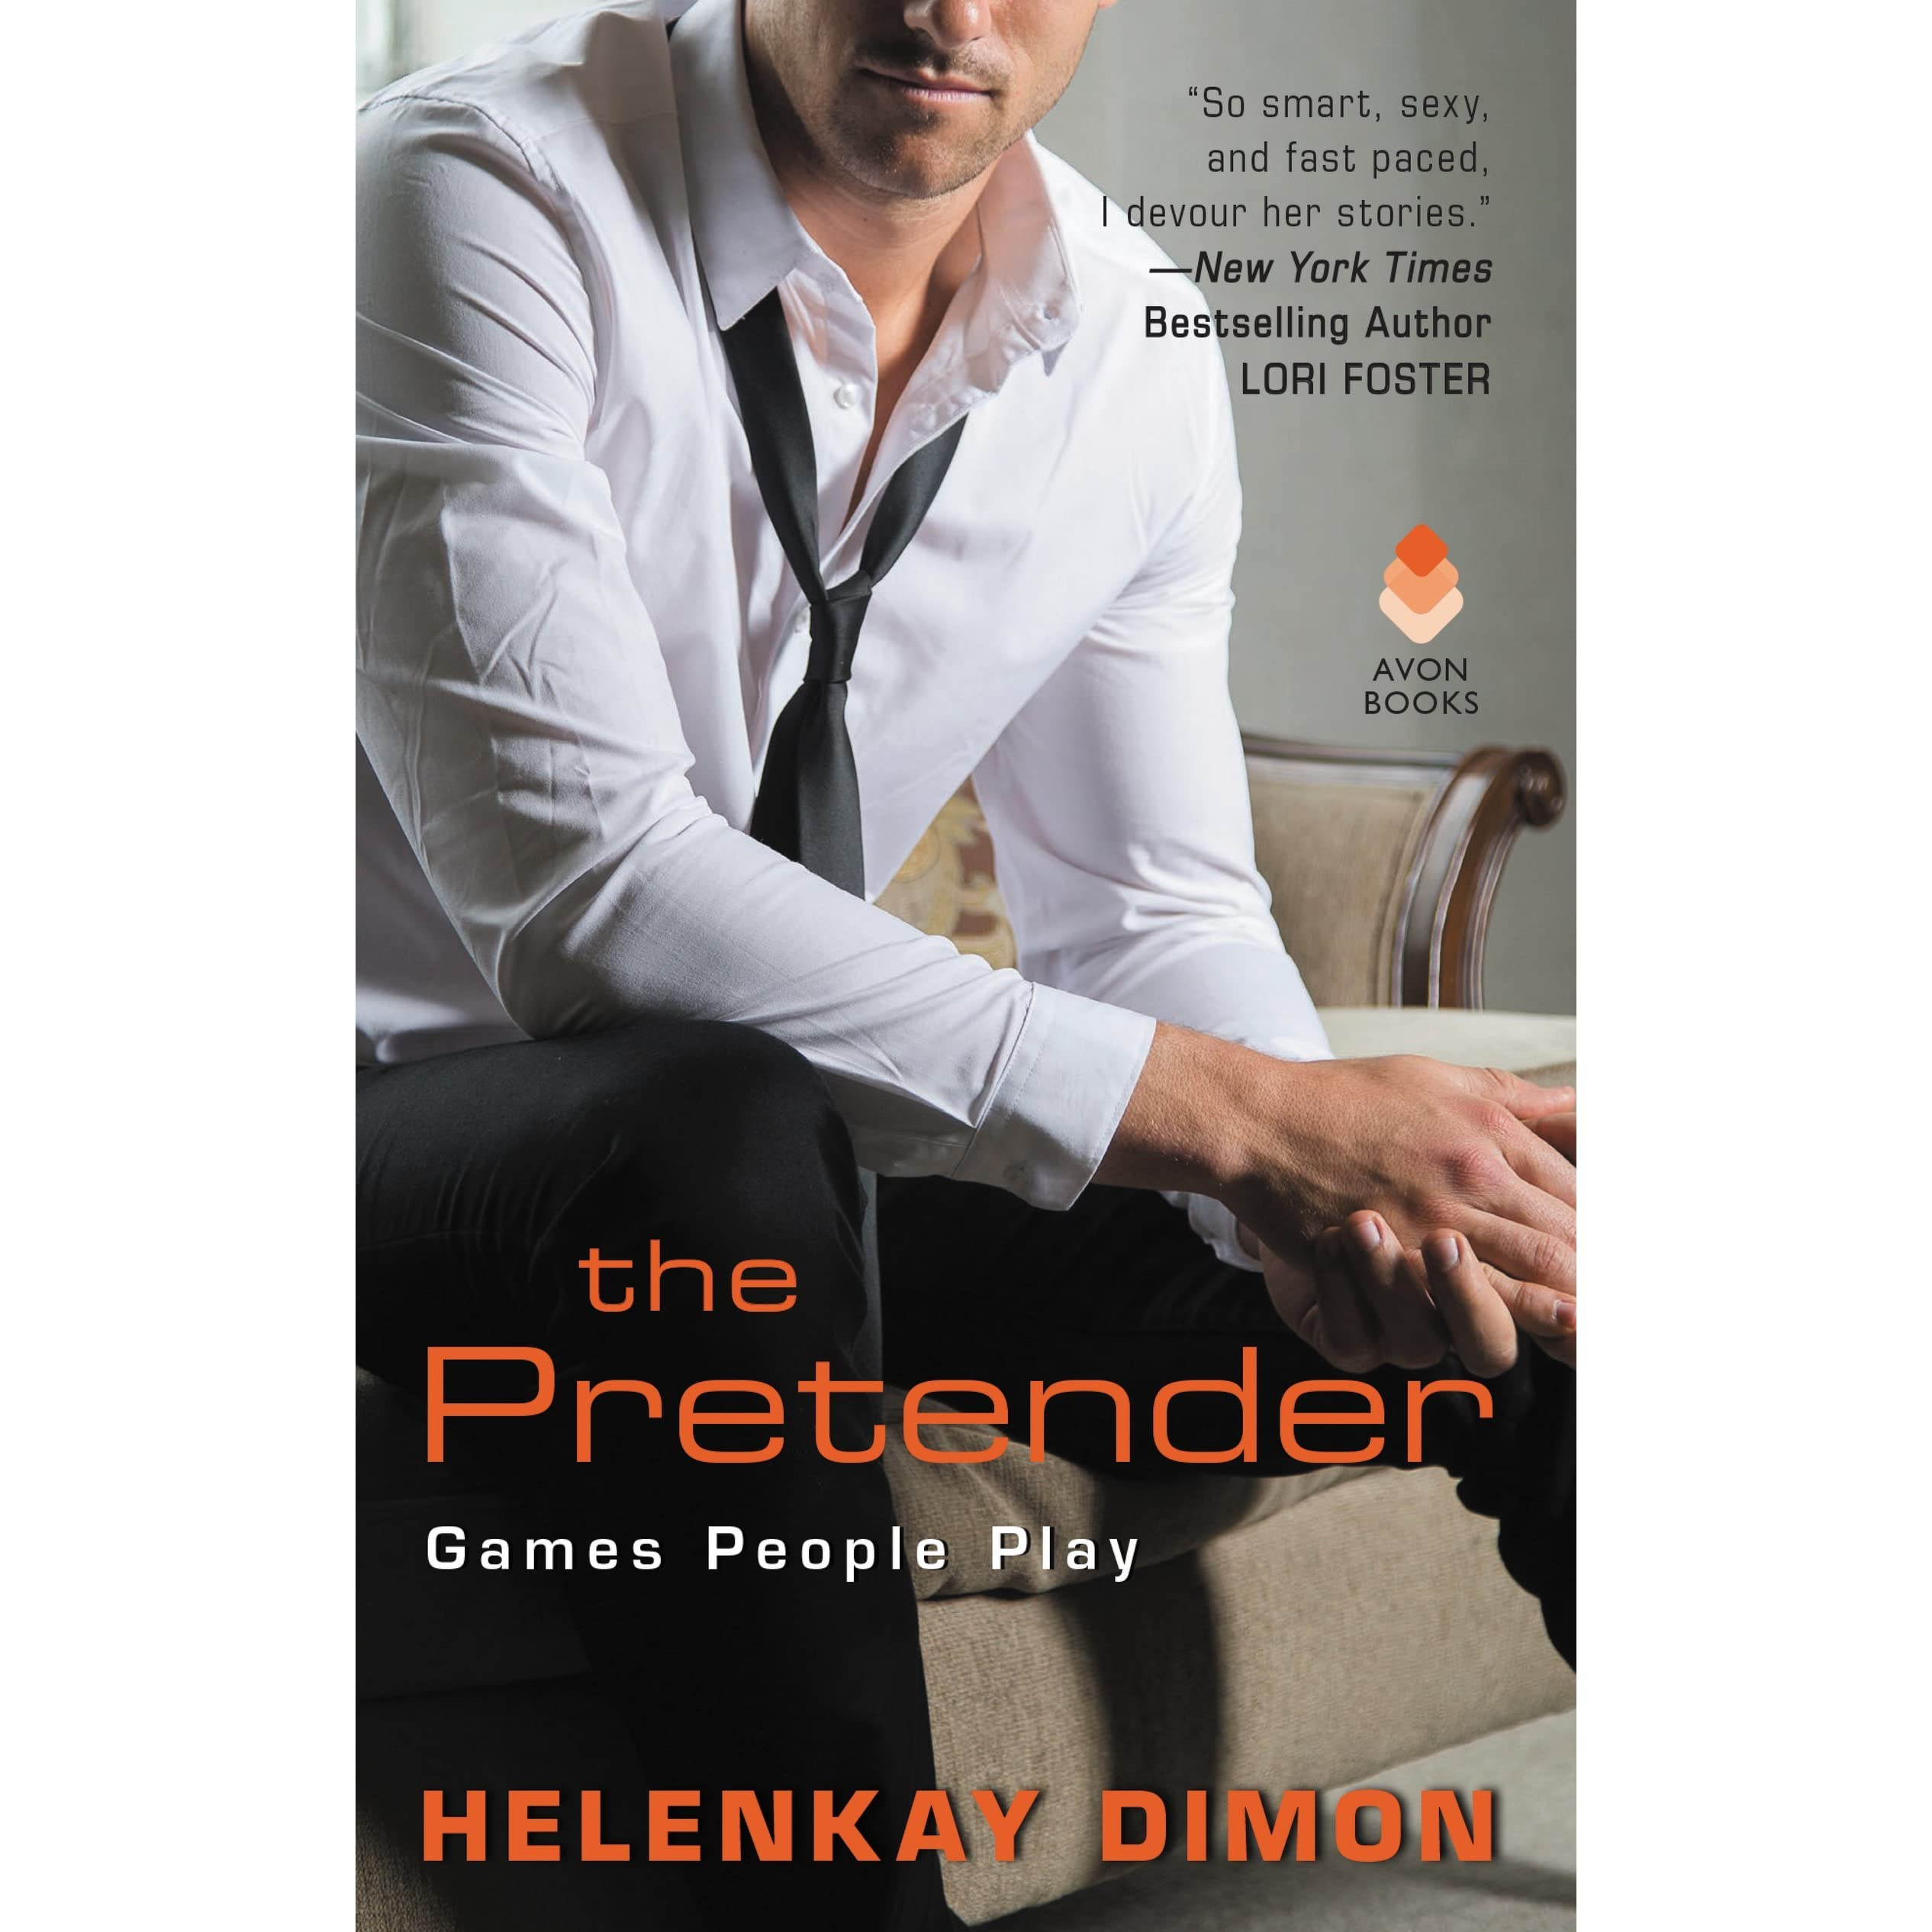 Helenkay dimon goodreads giveaways